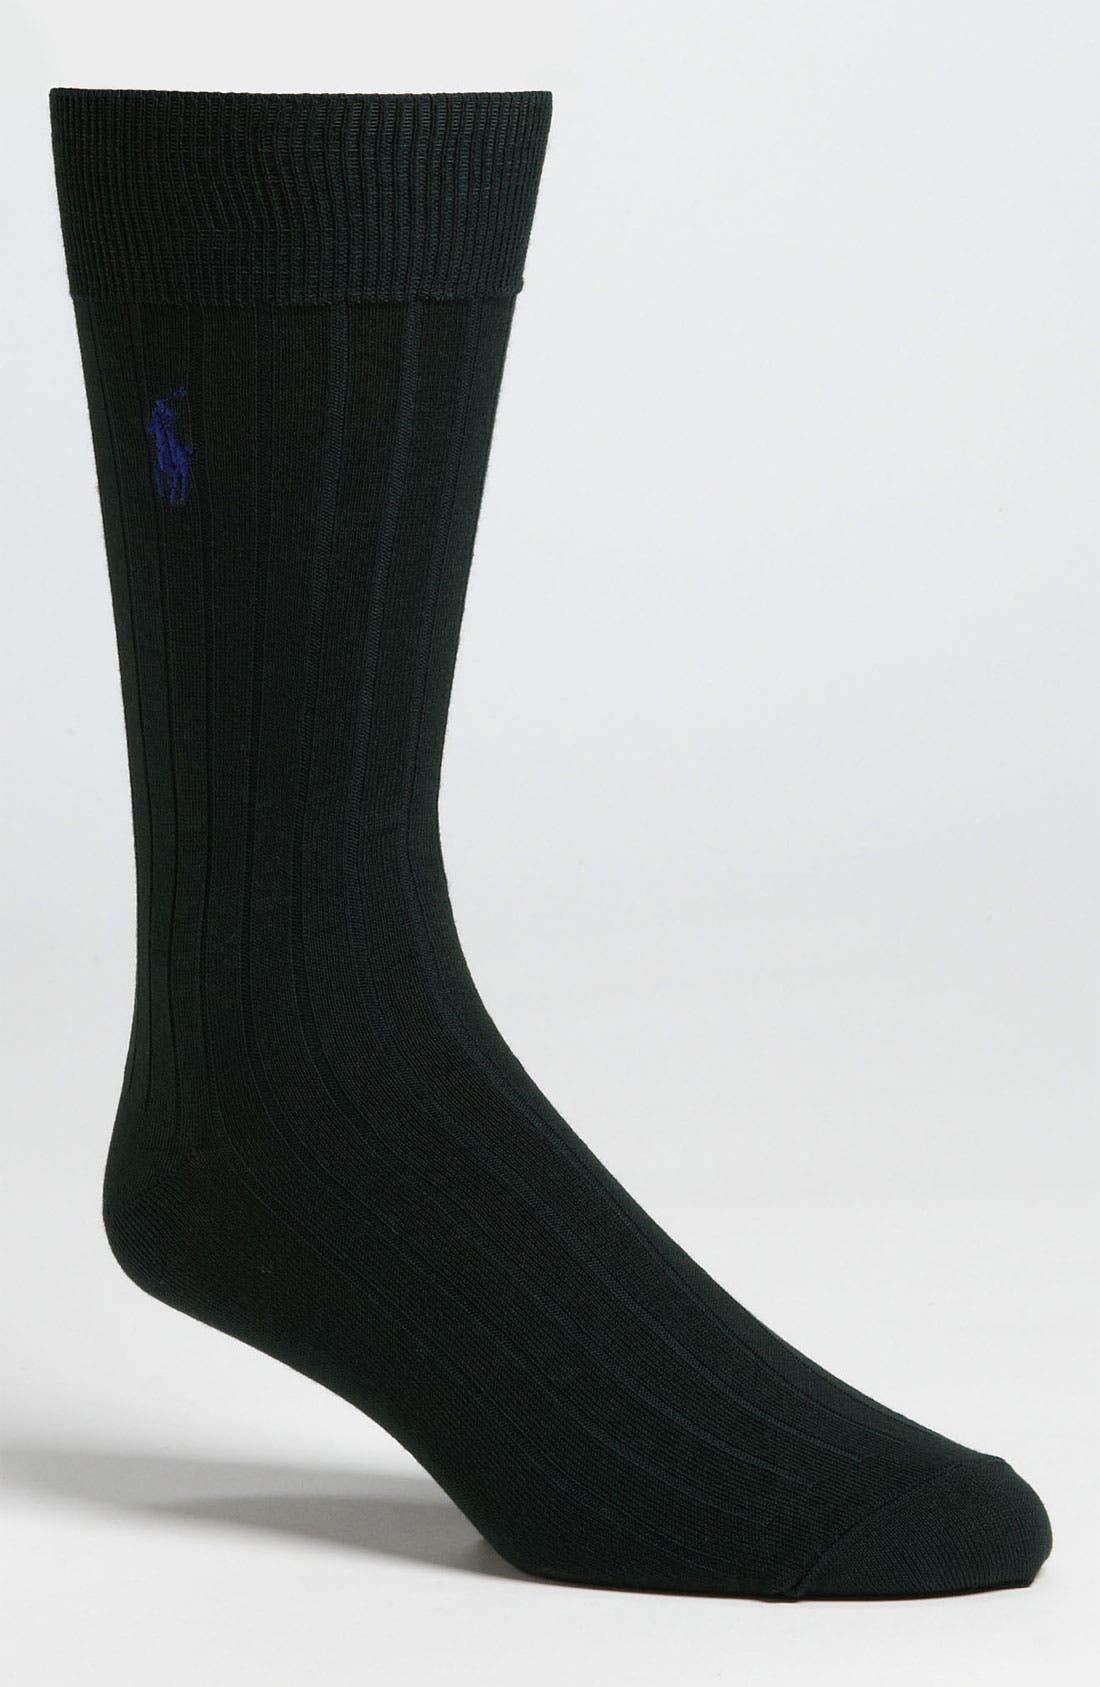 Alternate Image 1 Selected - Polo Ralph Lauren Rib Knit Cotton Socks